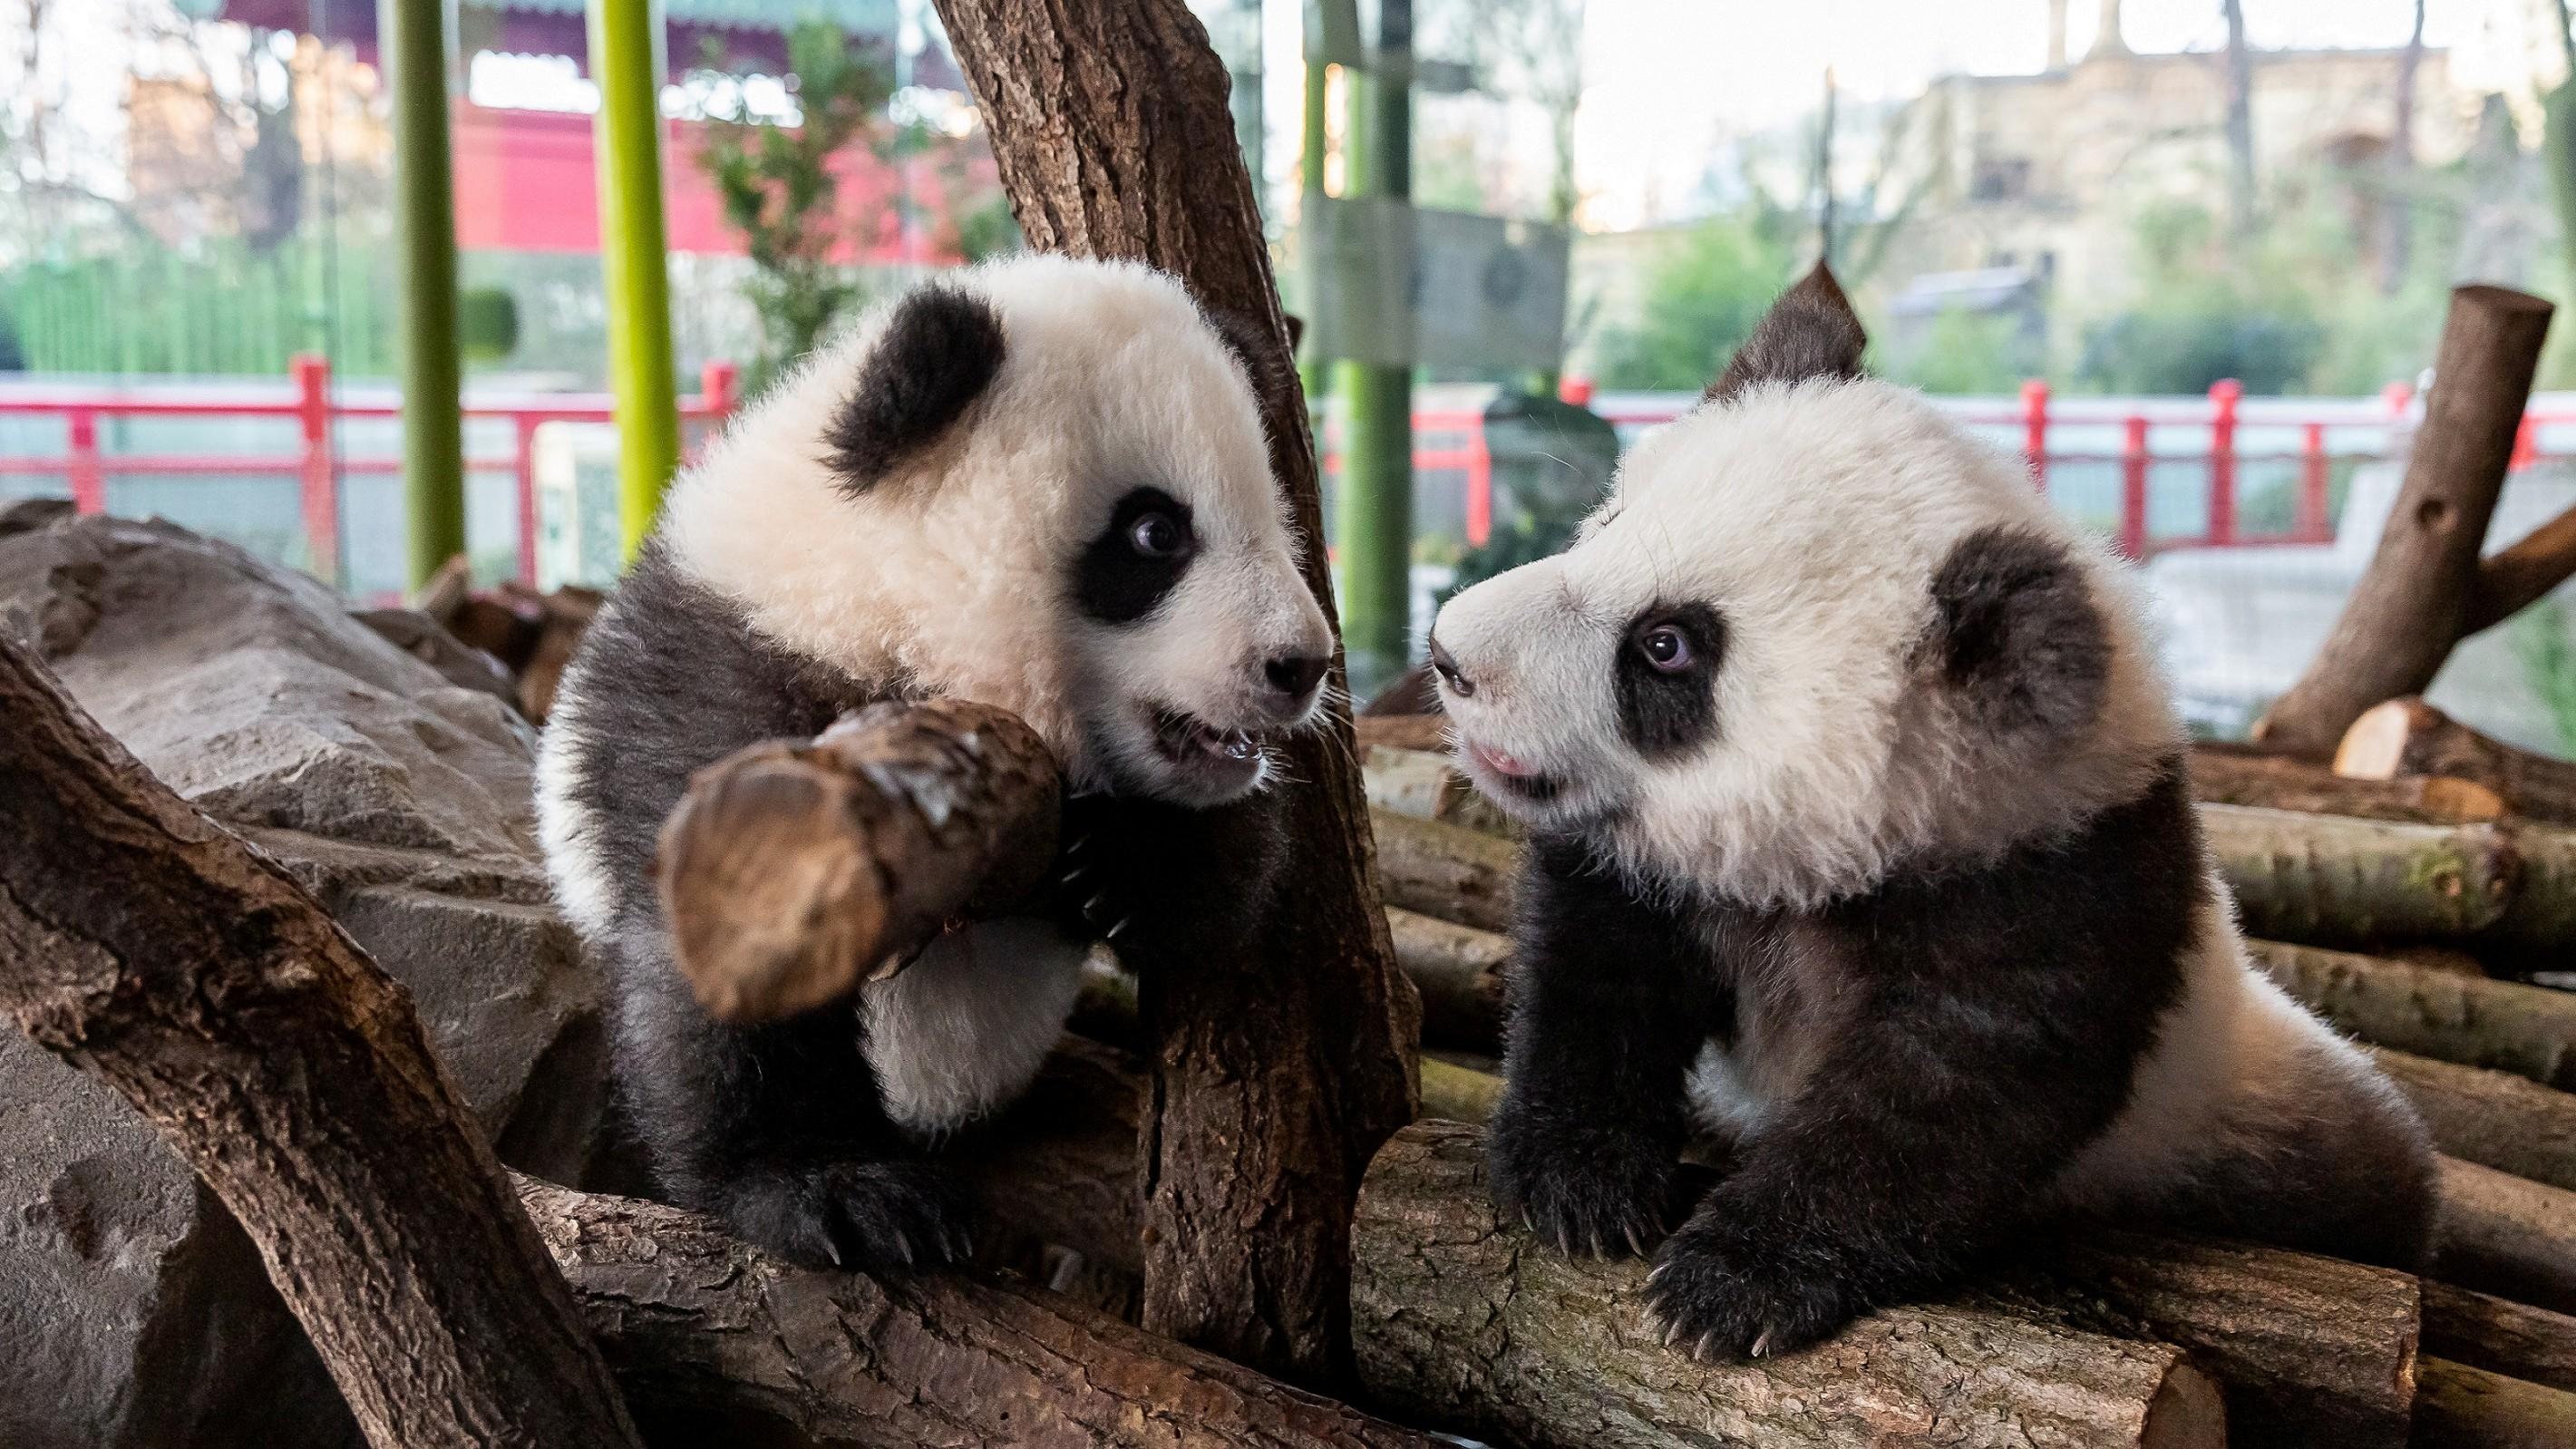 Lassen Herzen schmelzen: Bärlins neue (Panda)-Bärchen